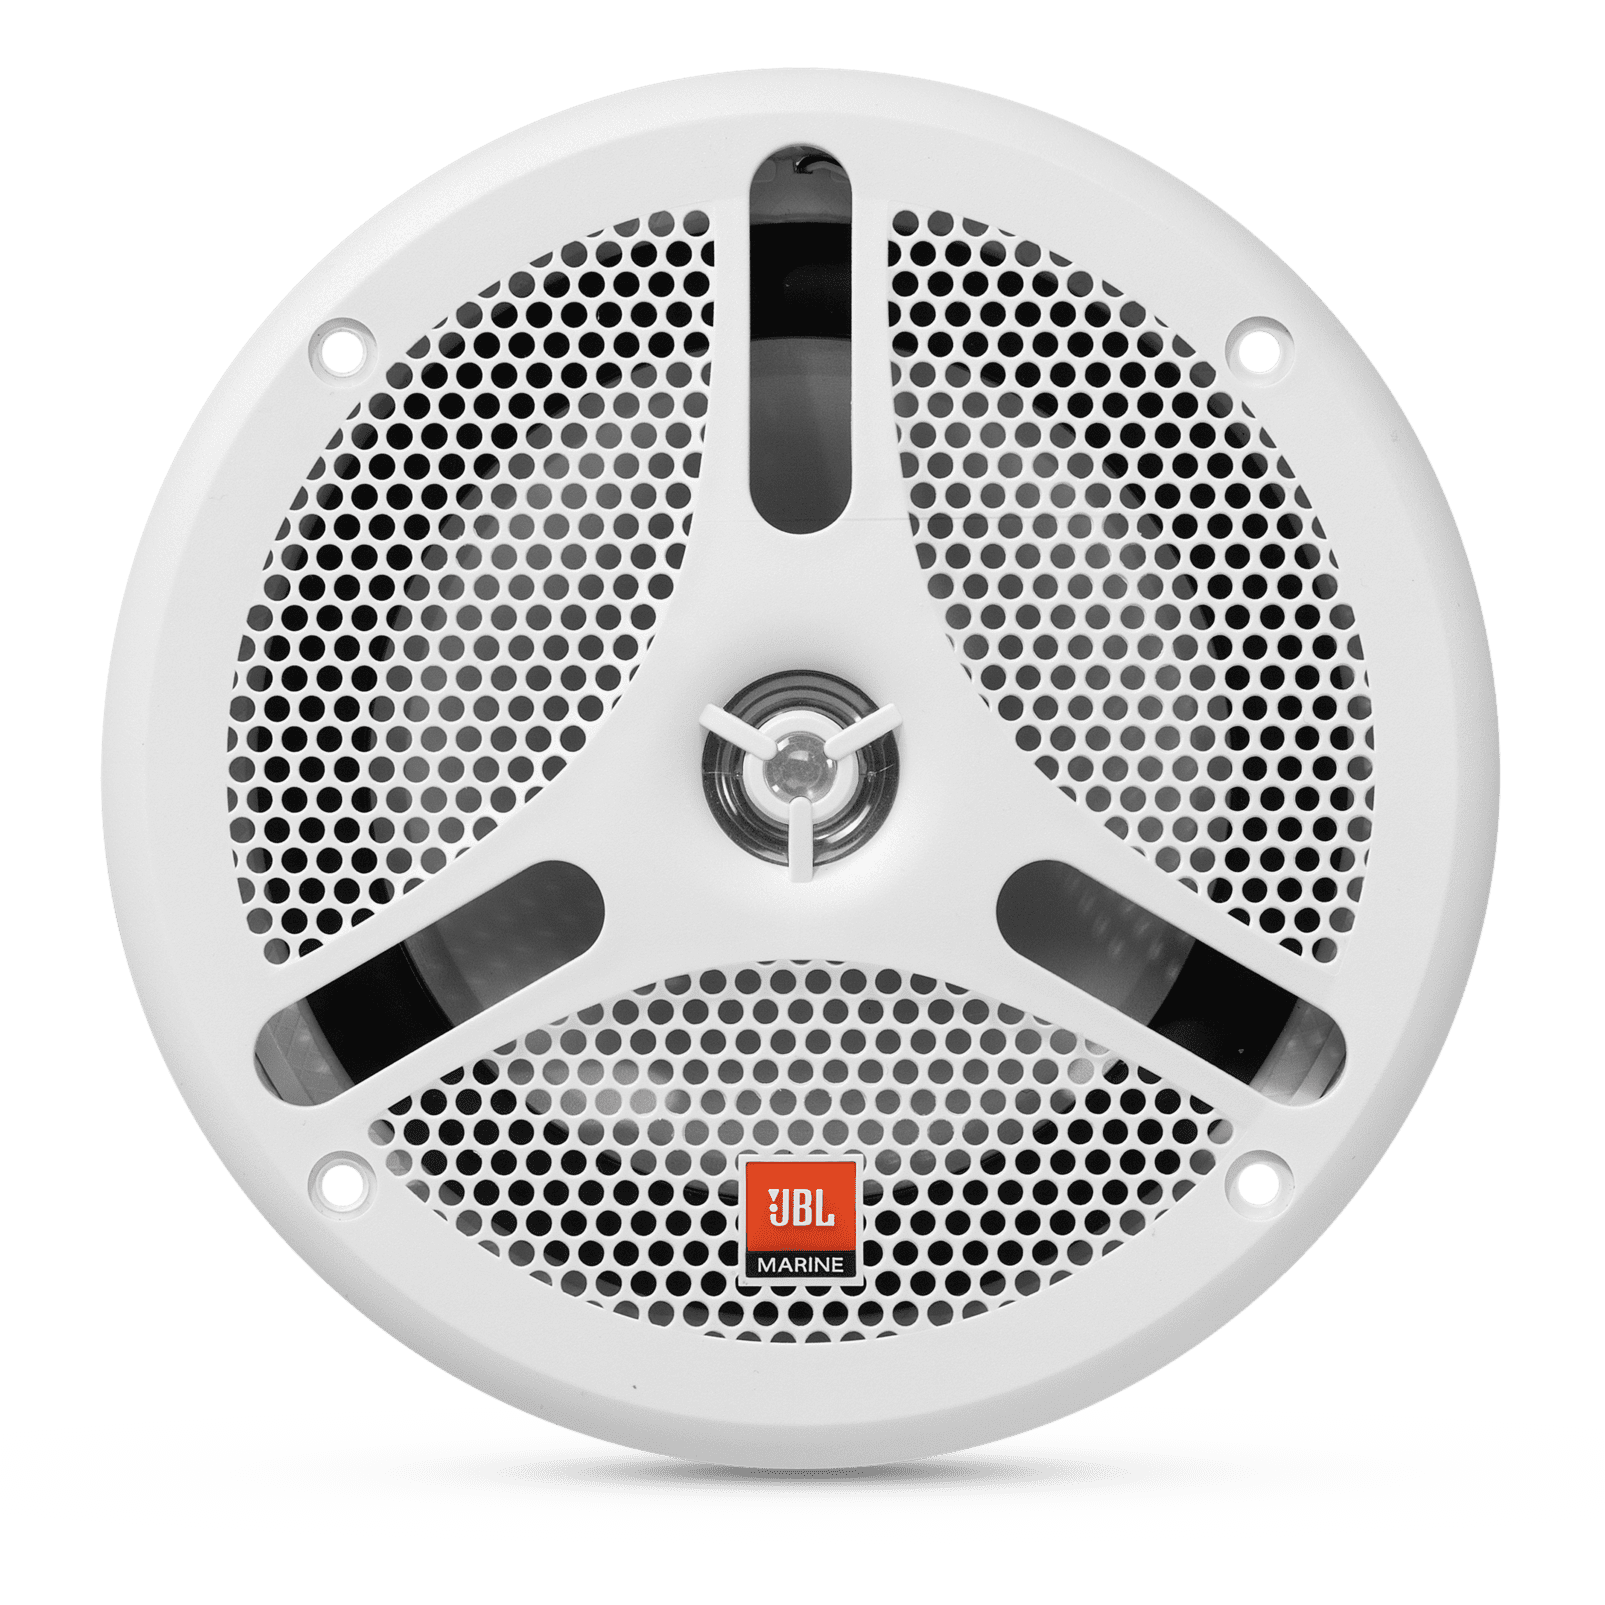 JBL Xtreme Portable Wireless Speaker (Black) - Walmart com